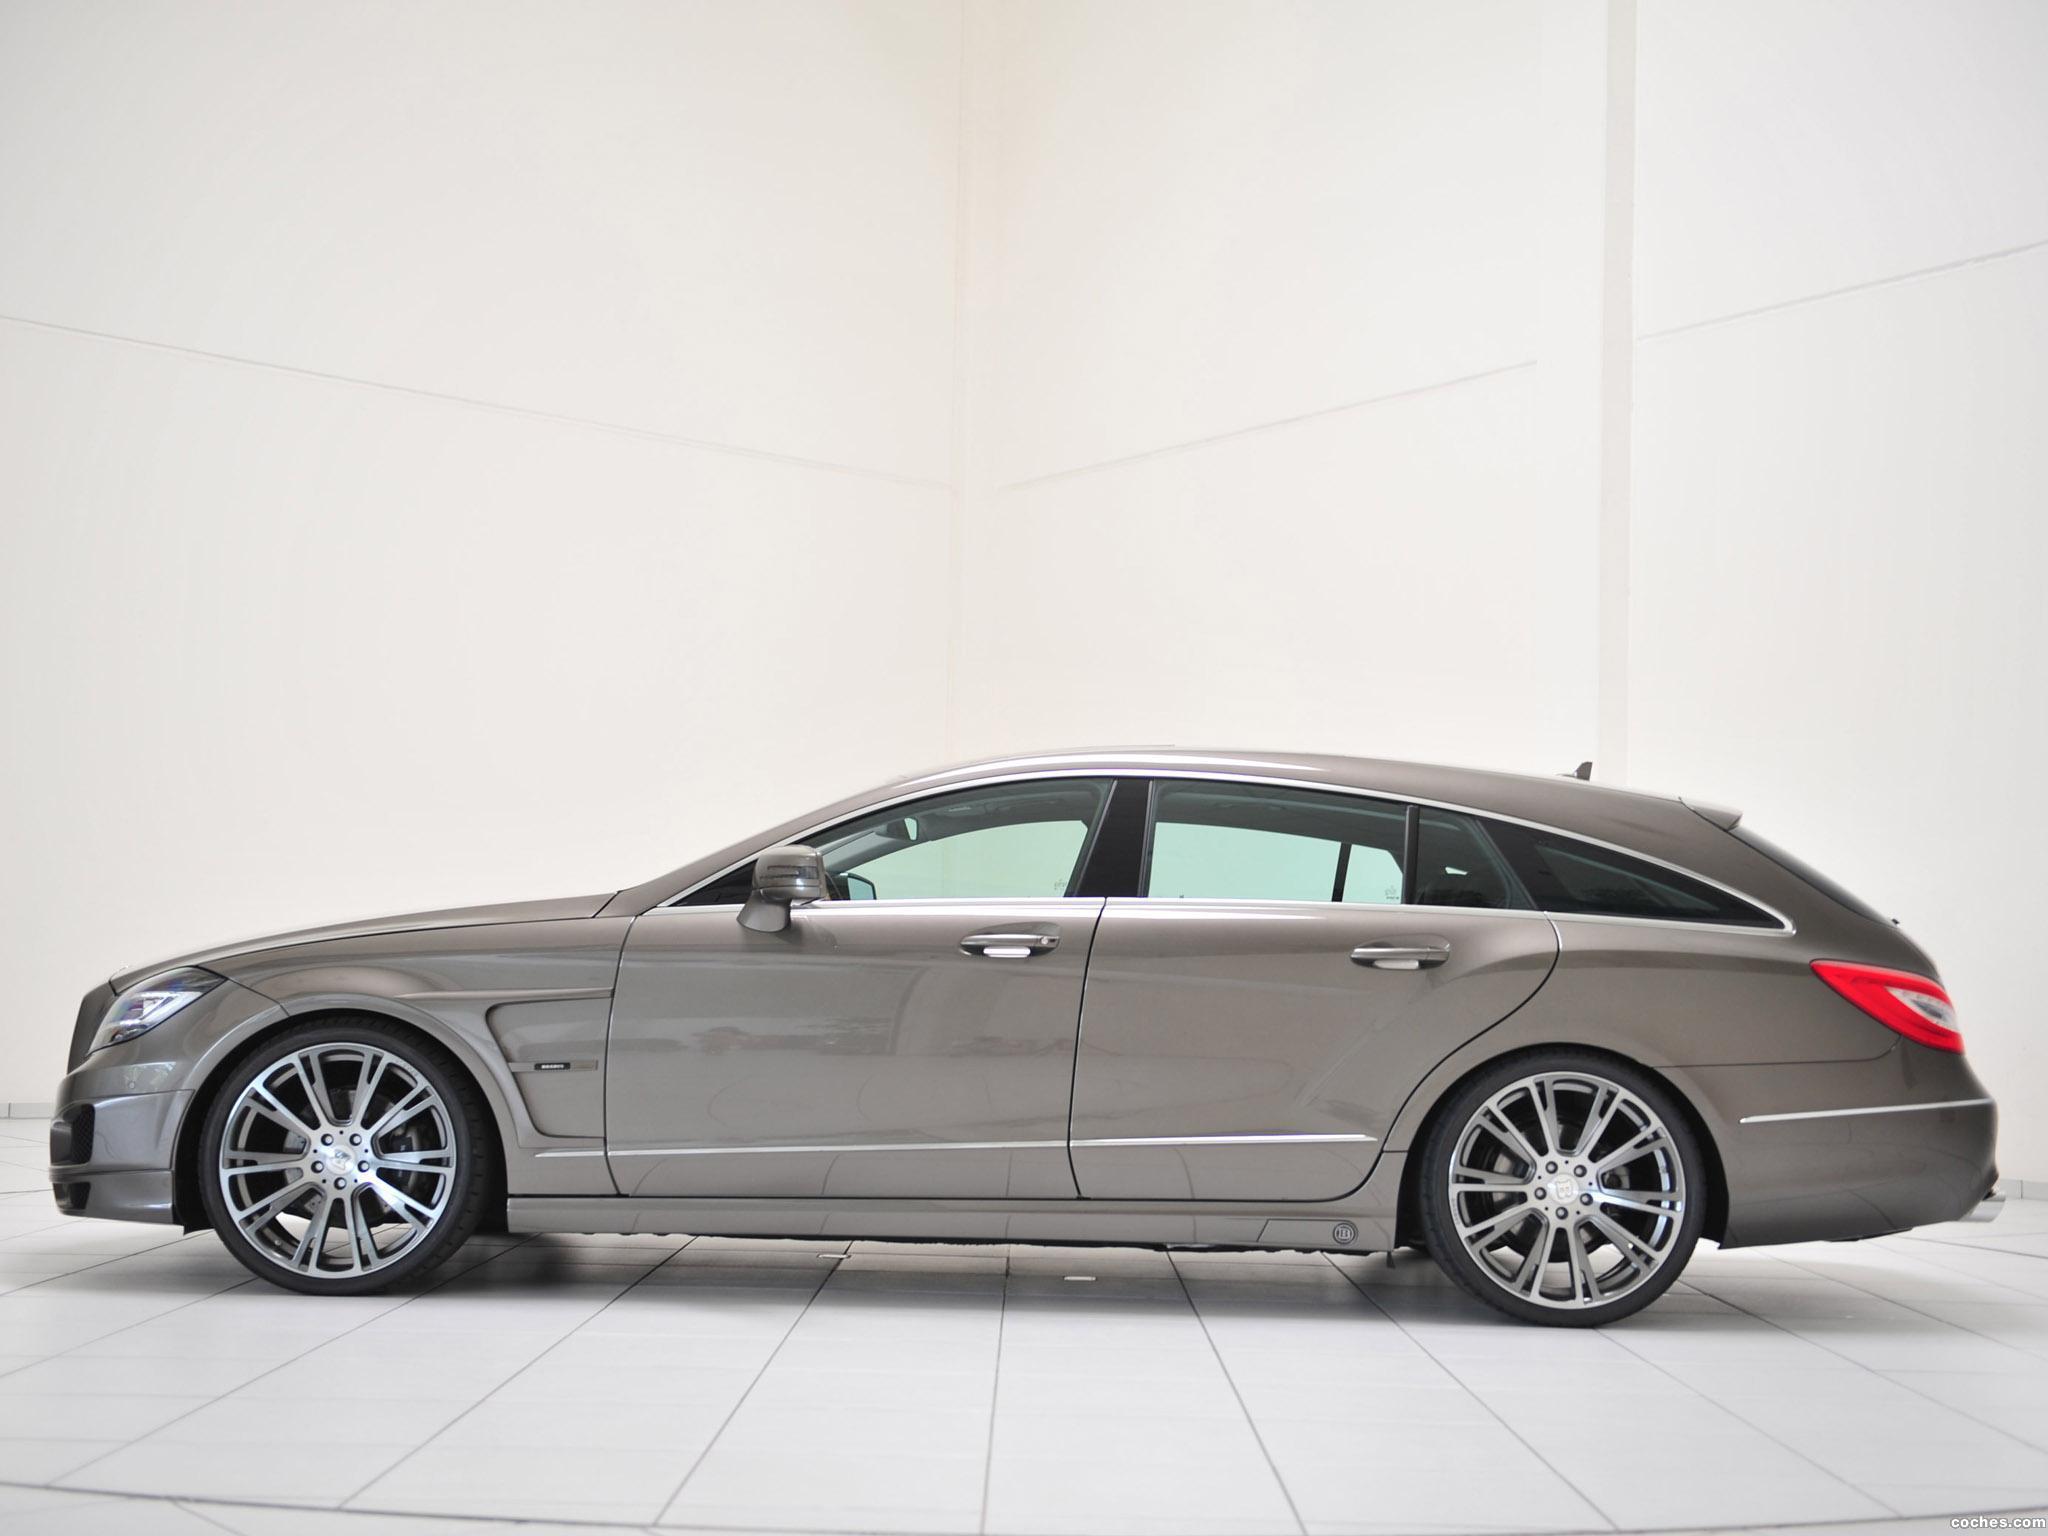 Foto 2 de Mercedes Brabus CLS Shooting Brake X218 2012